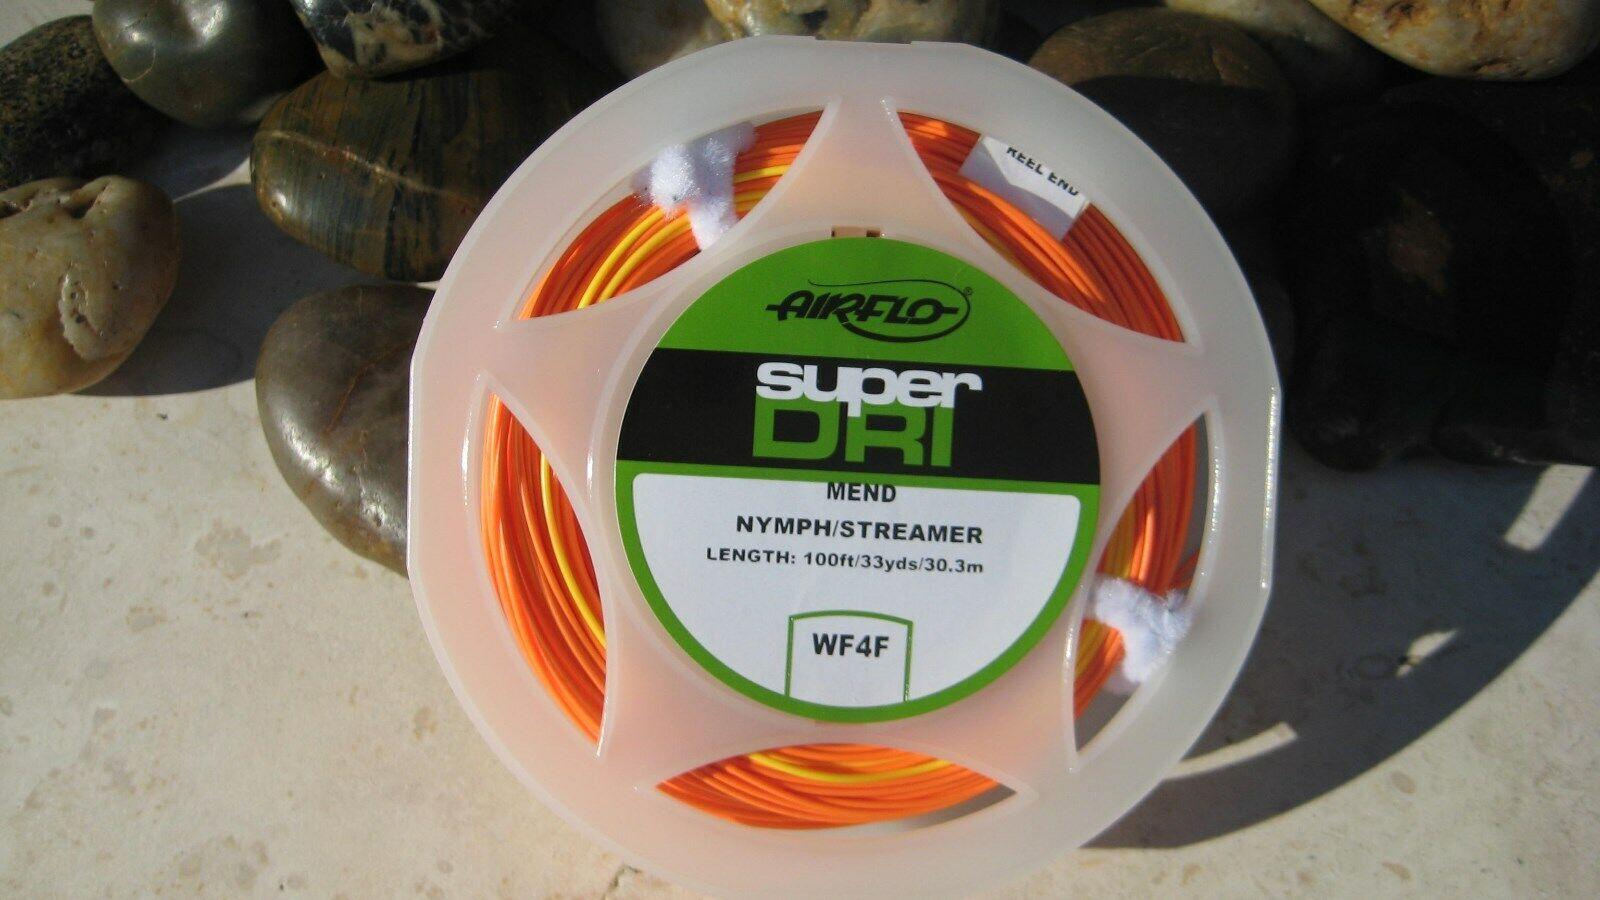 Airflo Super Dri Nymph Streamer Fly Line,  WF-4-F, Hot Coral, NIB  good quality